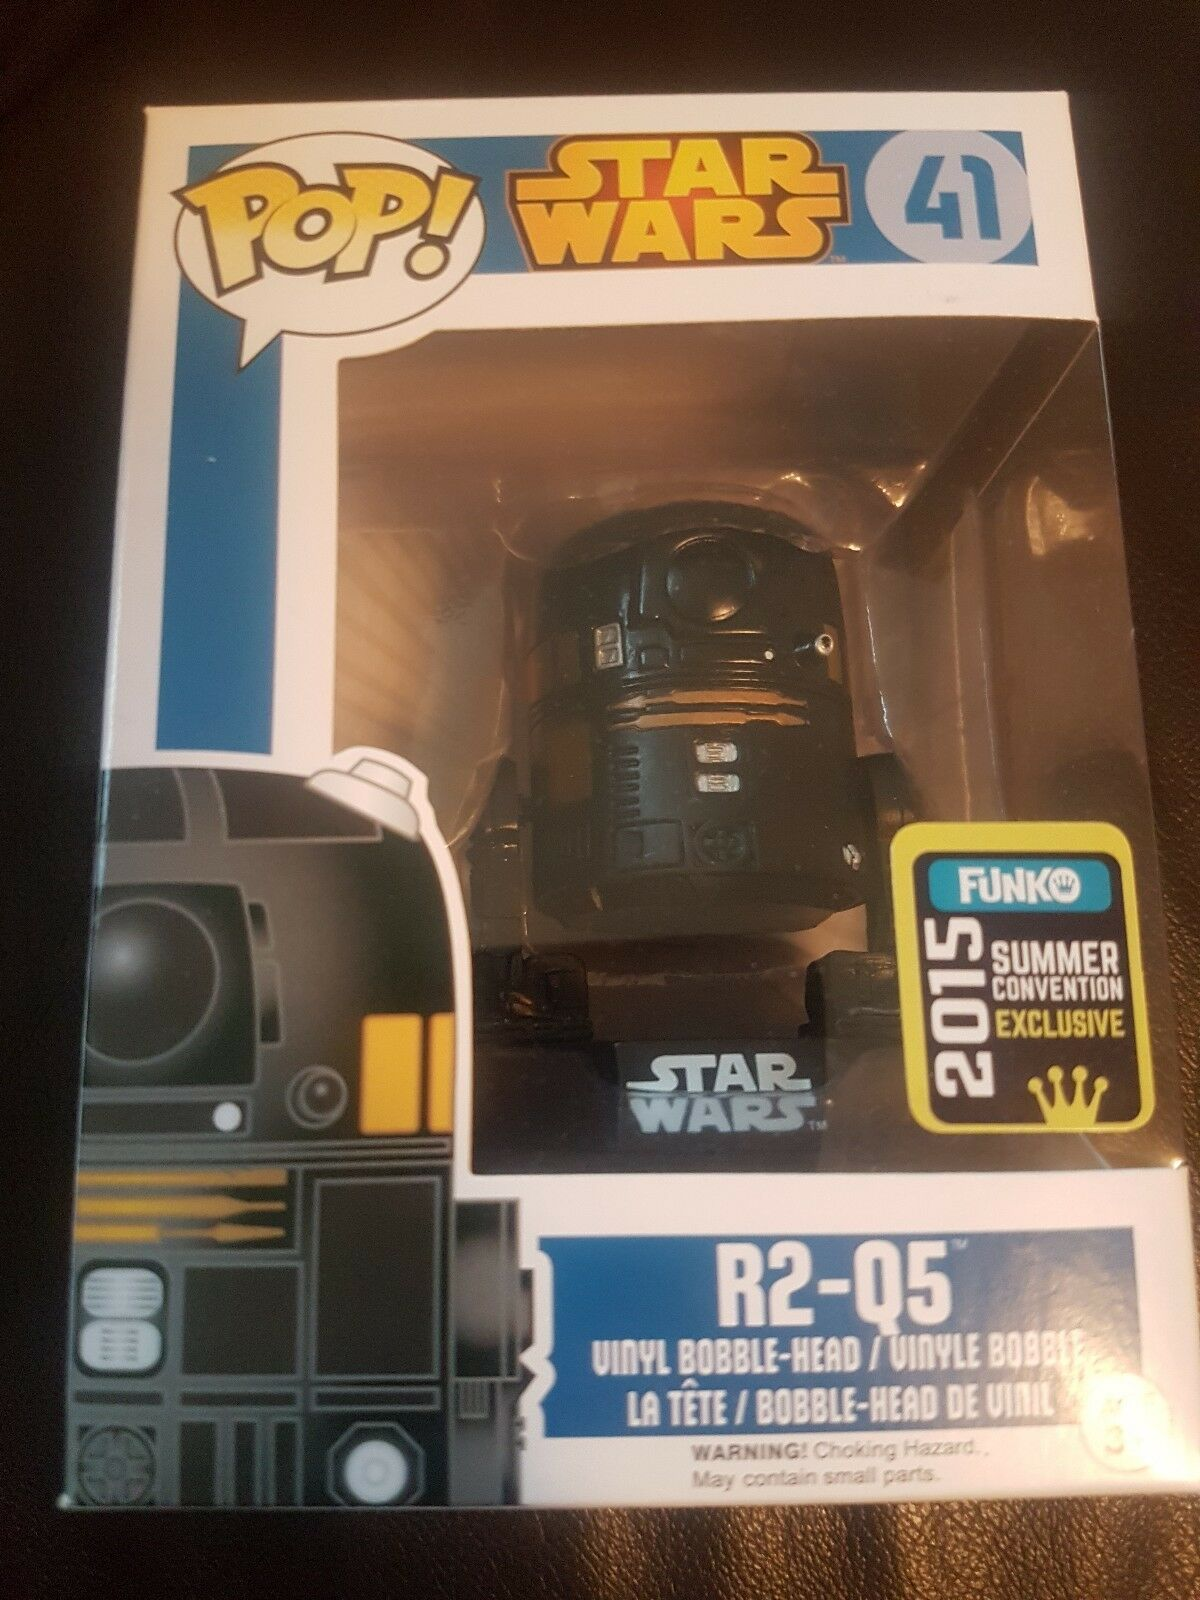 Star wars Funko POP R2-Q5 SDCC Summer Convention Exclusive  41